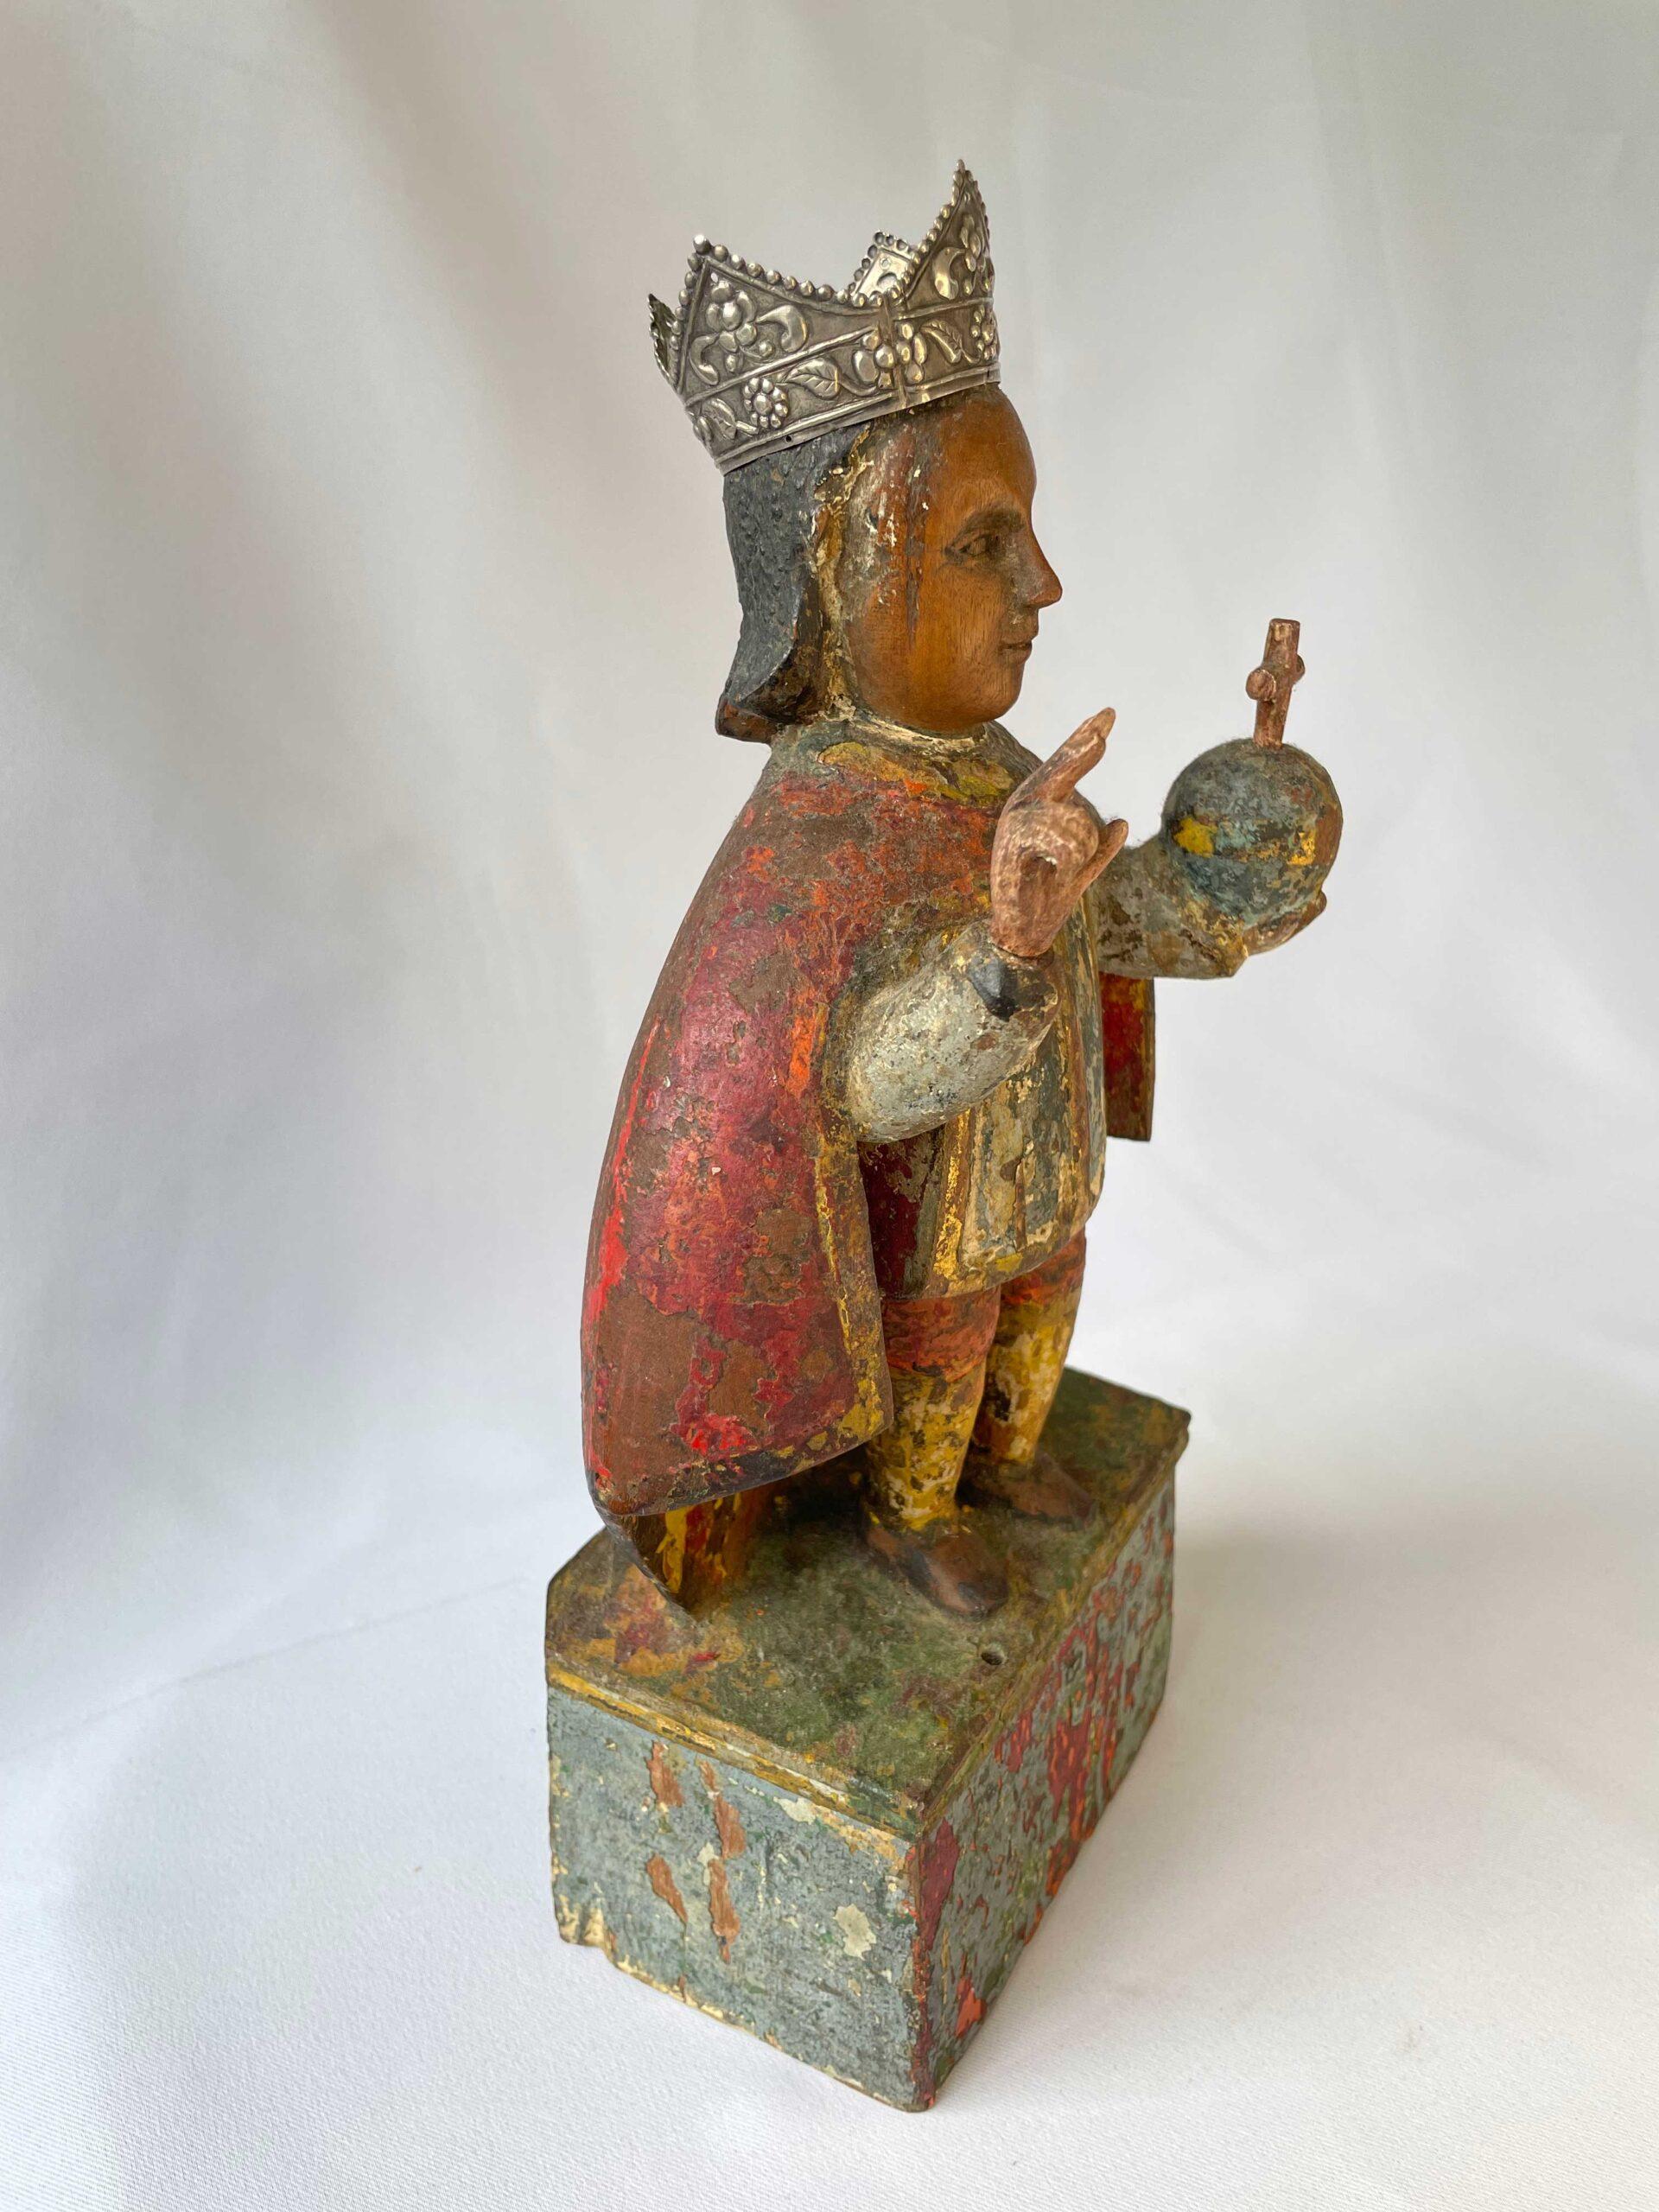 Santo Niño (Holy Child), Bohol (19th Century)